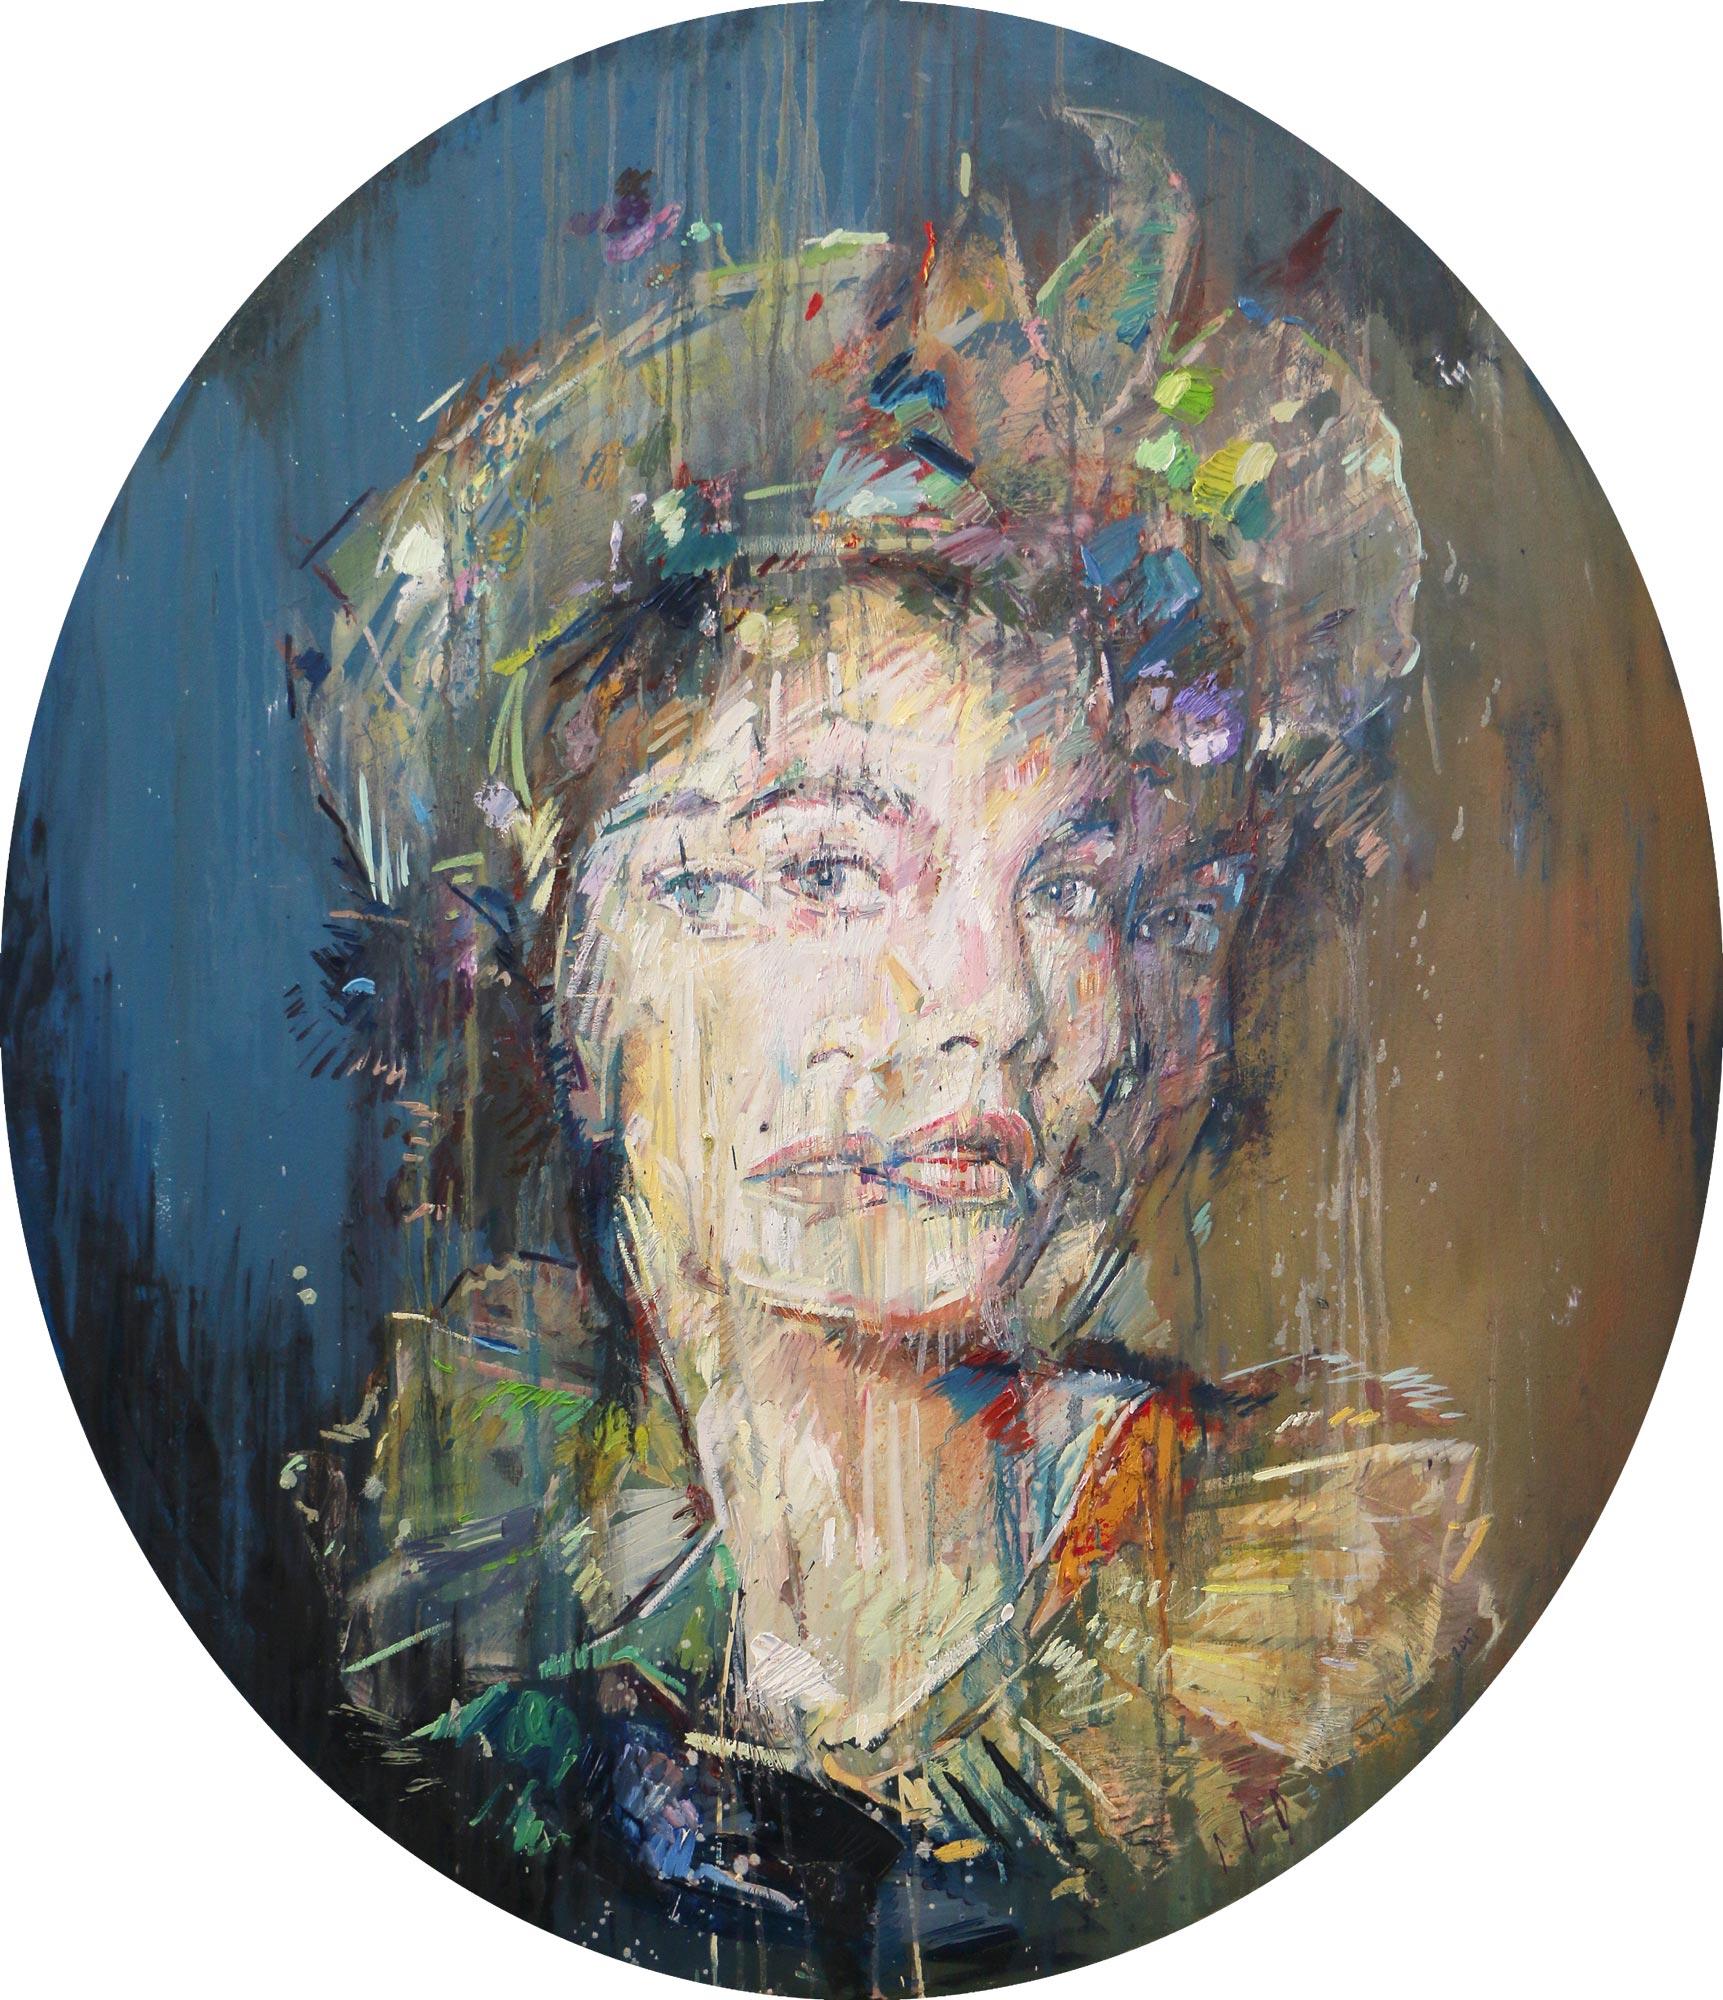 Prismatic Poise (Urd Rosso). Oil on canvas. 130cm x 112cm.